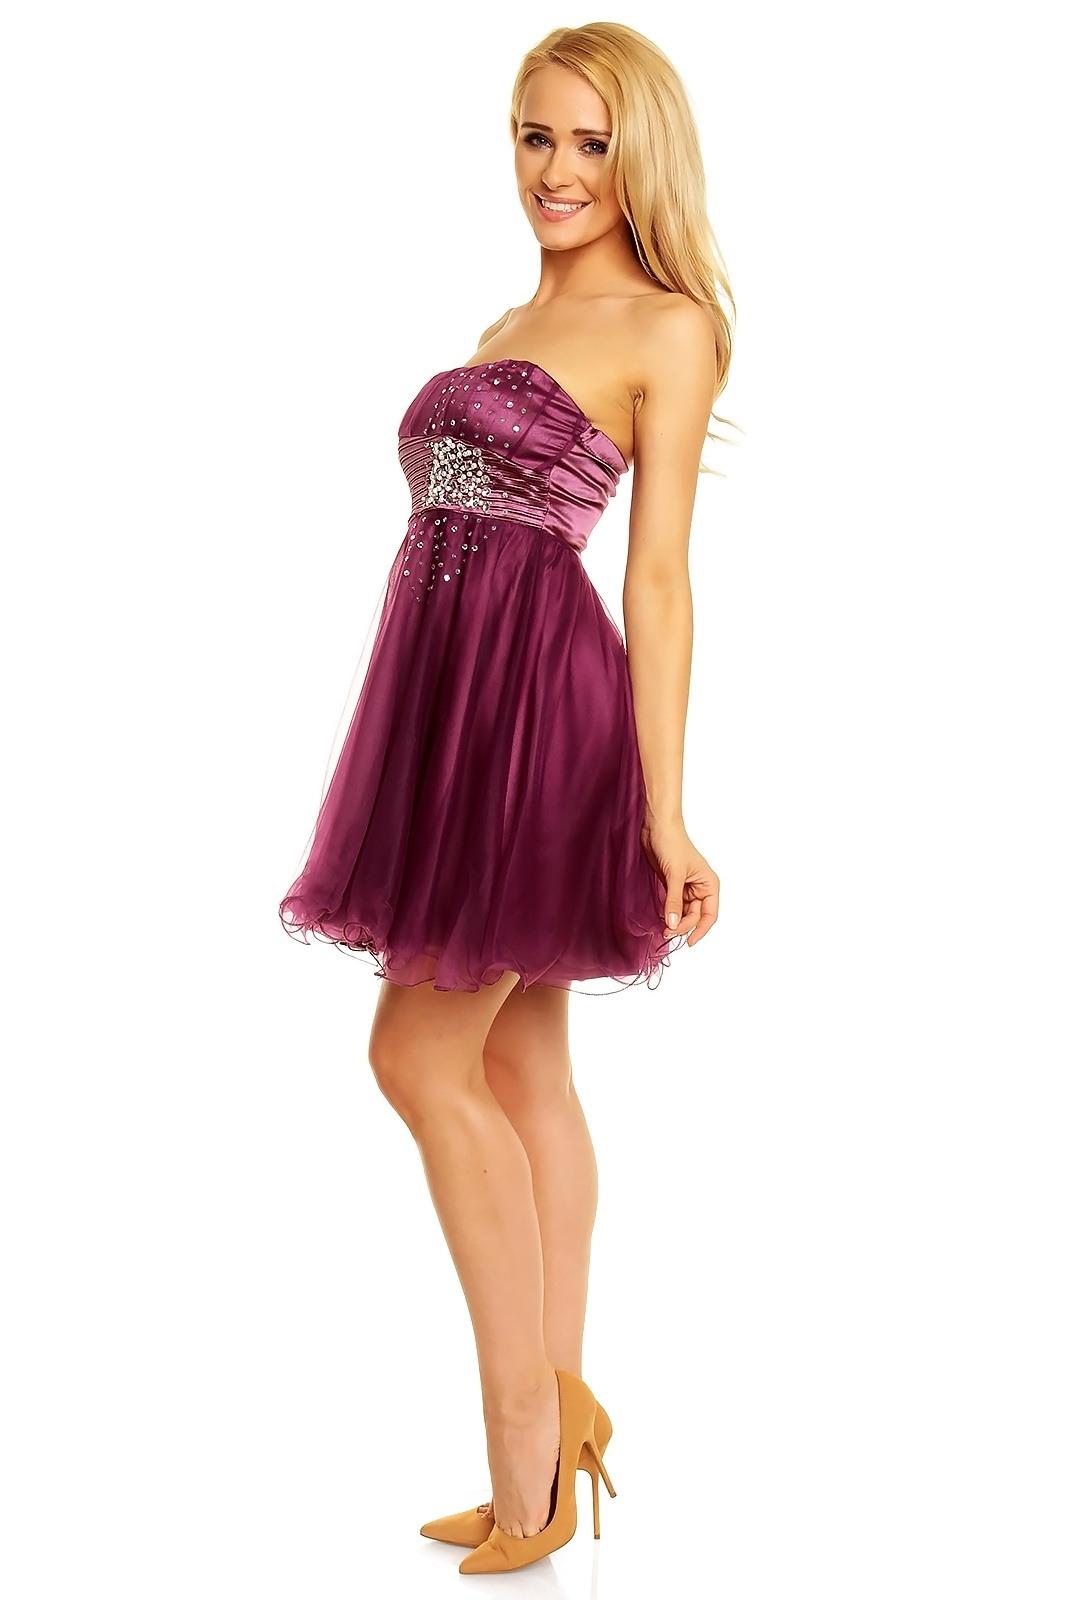 13 Top Kleid Lila Kurz Ärmel20 Erstaunlich Kleid Lila Kurz Spezialgebiet